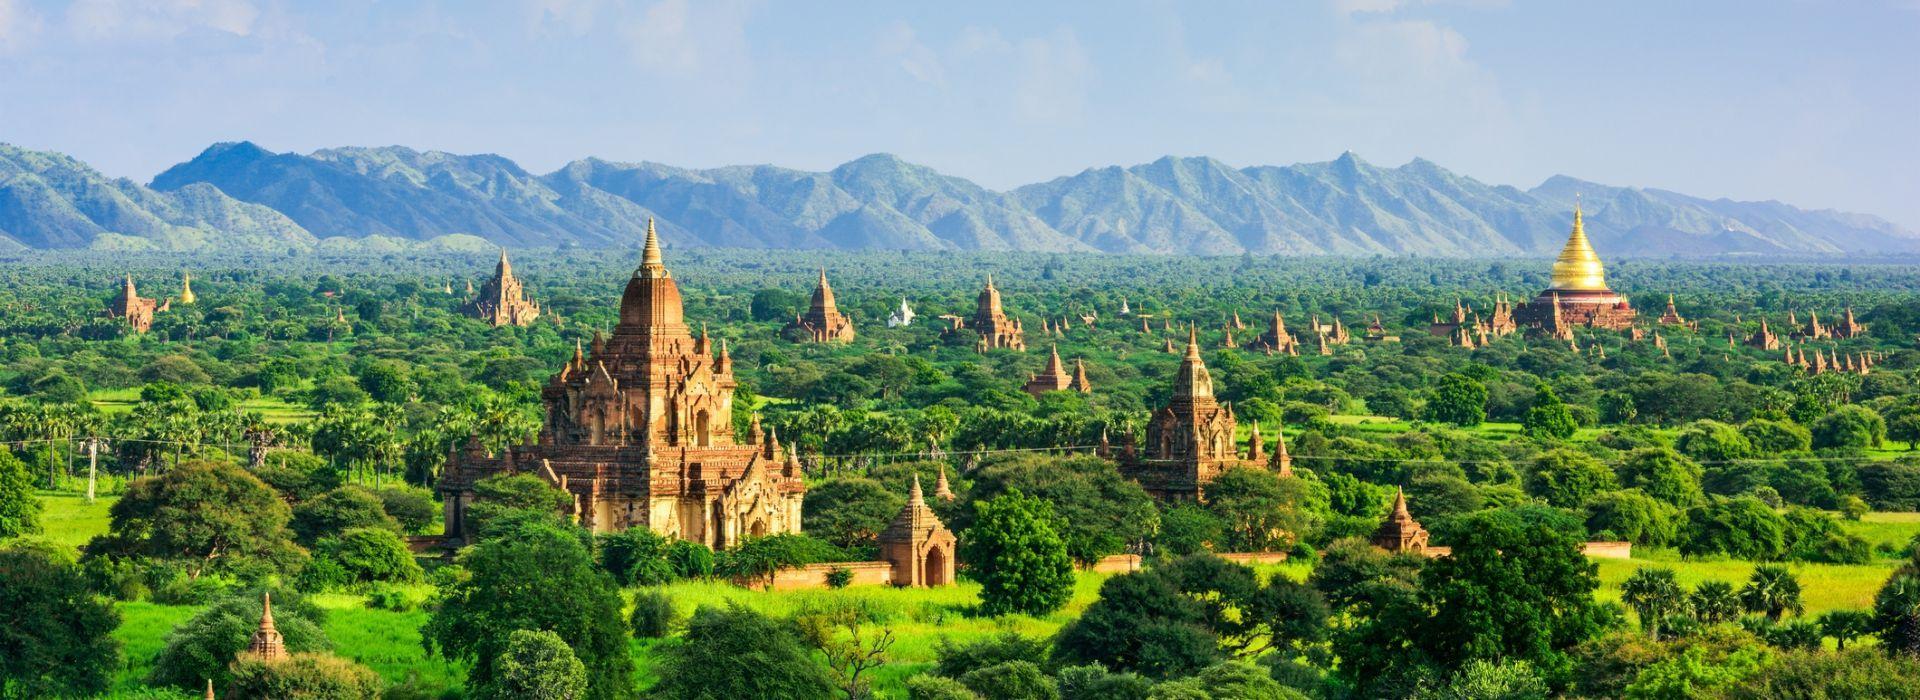 Adventure Tours in Bagan